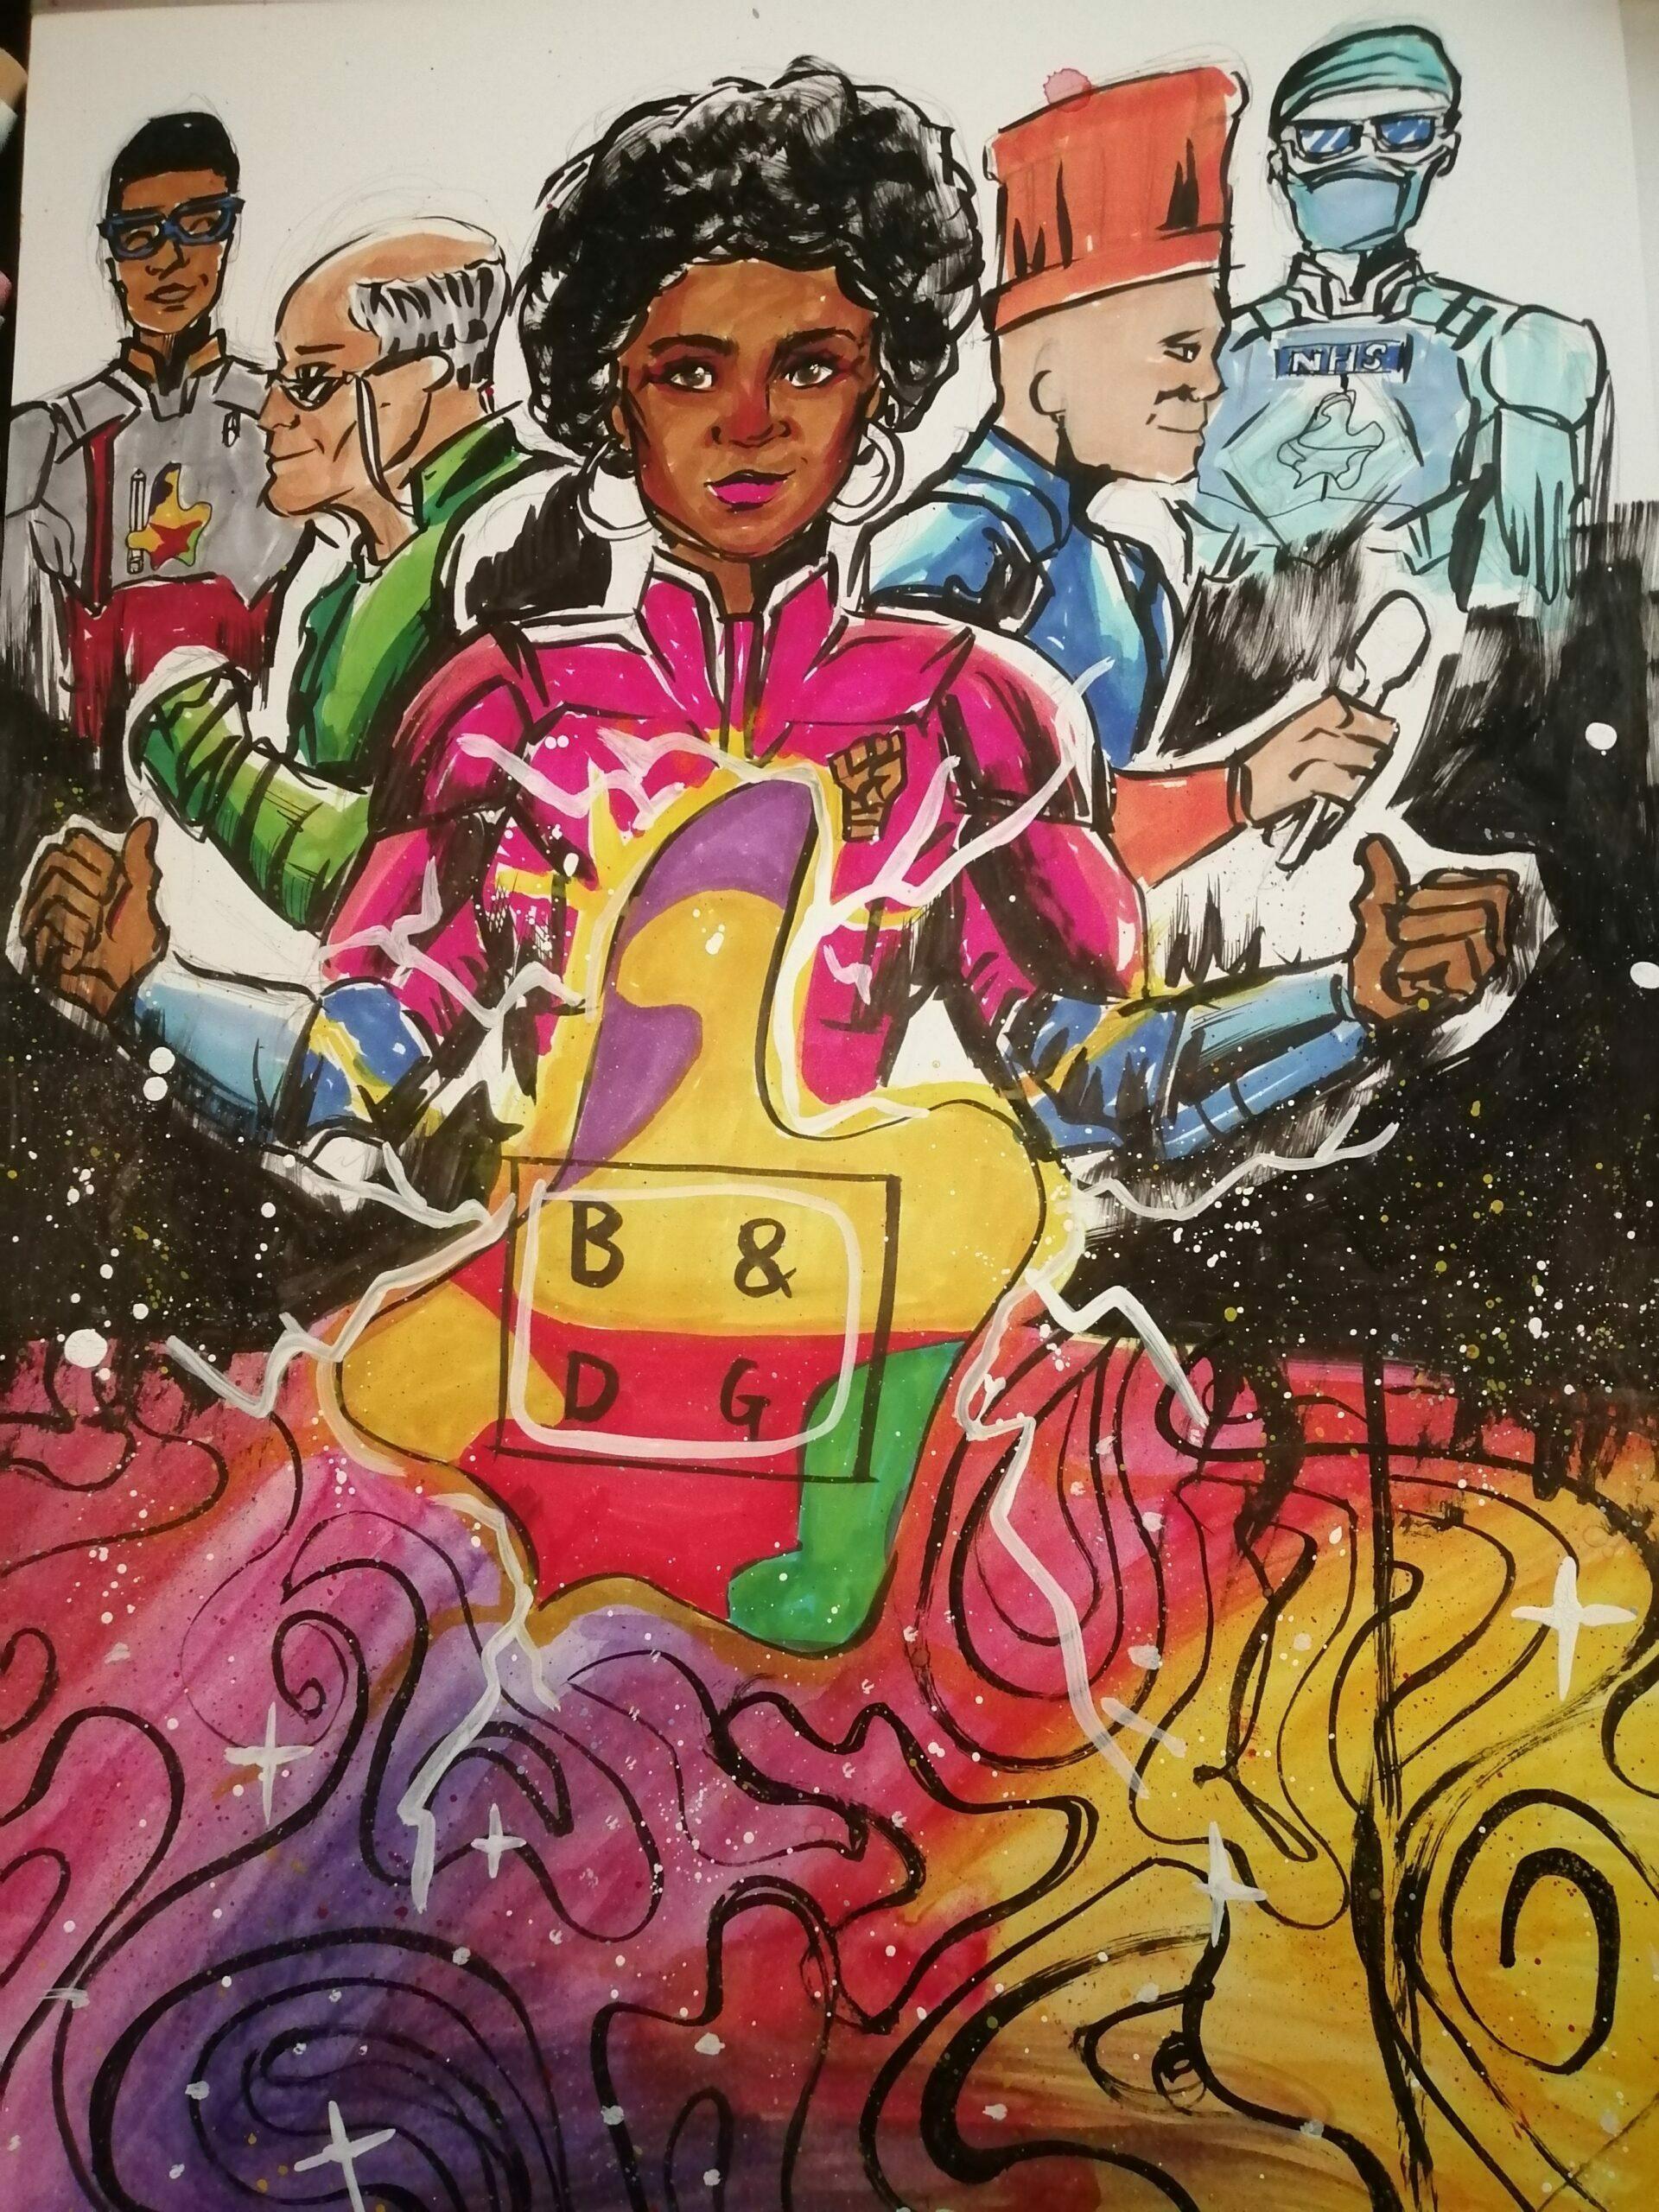 Emmanuel Oreyene Endowment Artwork: BD Giving as a source of power for the community